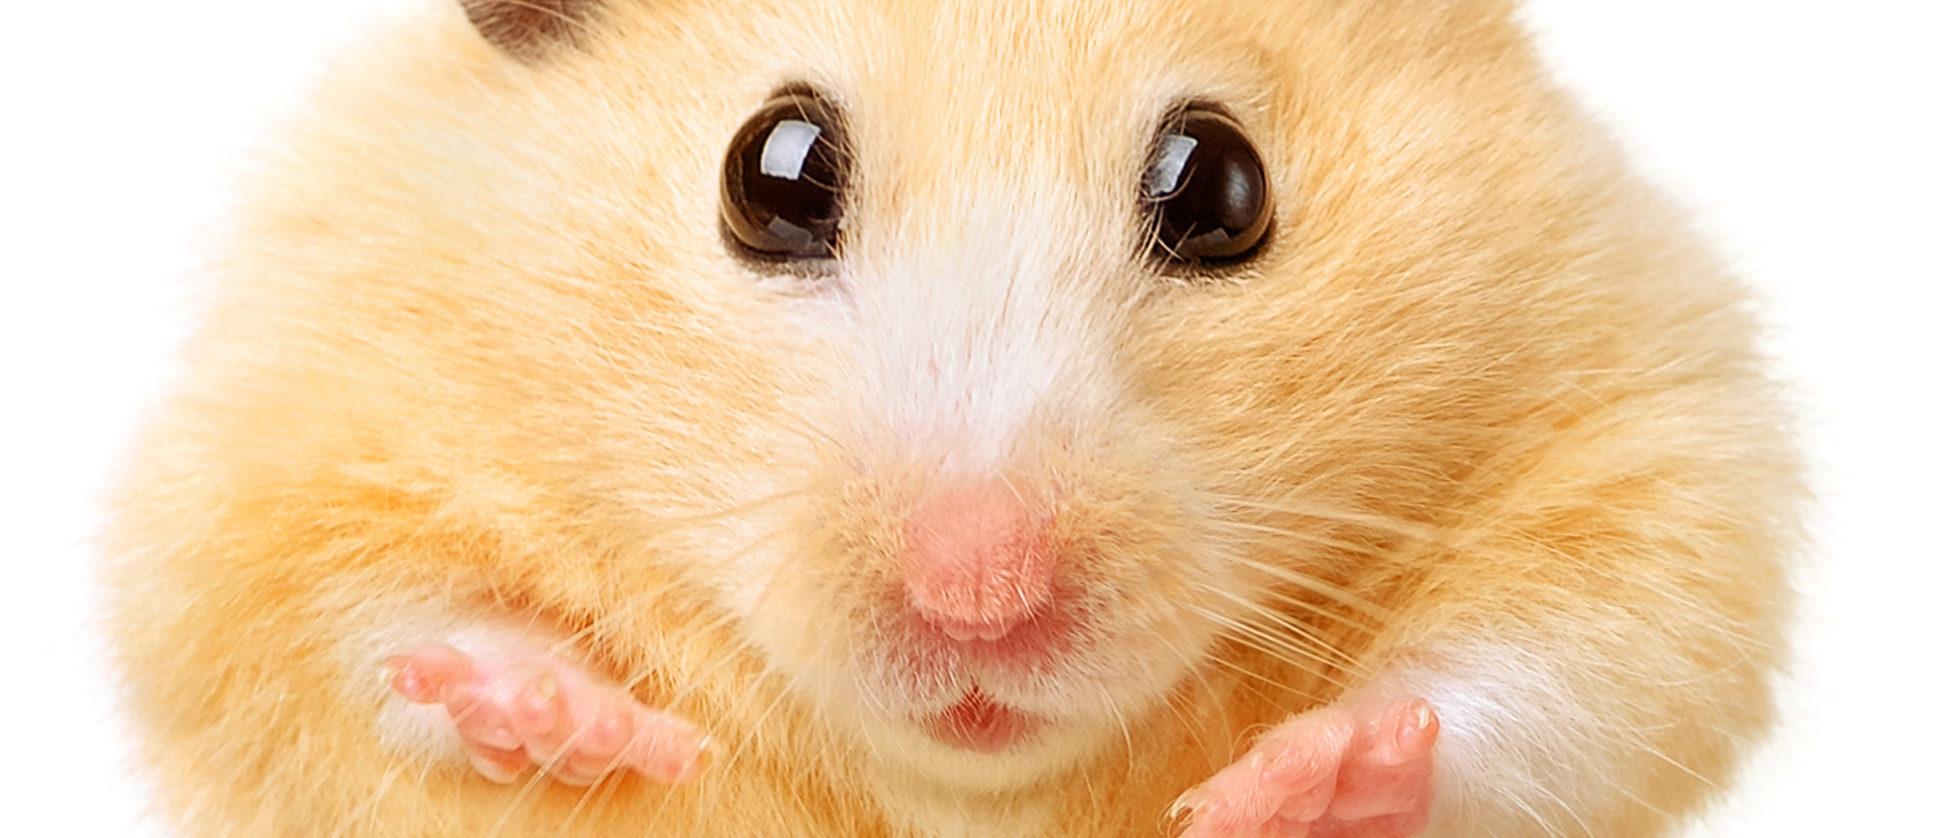 Fat funny hamster isolated on white background. (Shutterstock/Igor Kovalchuck)